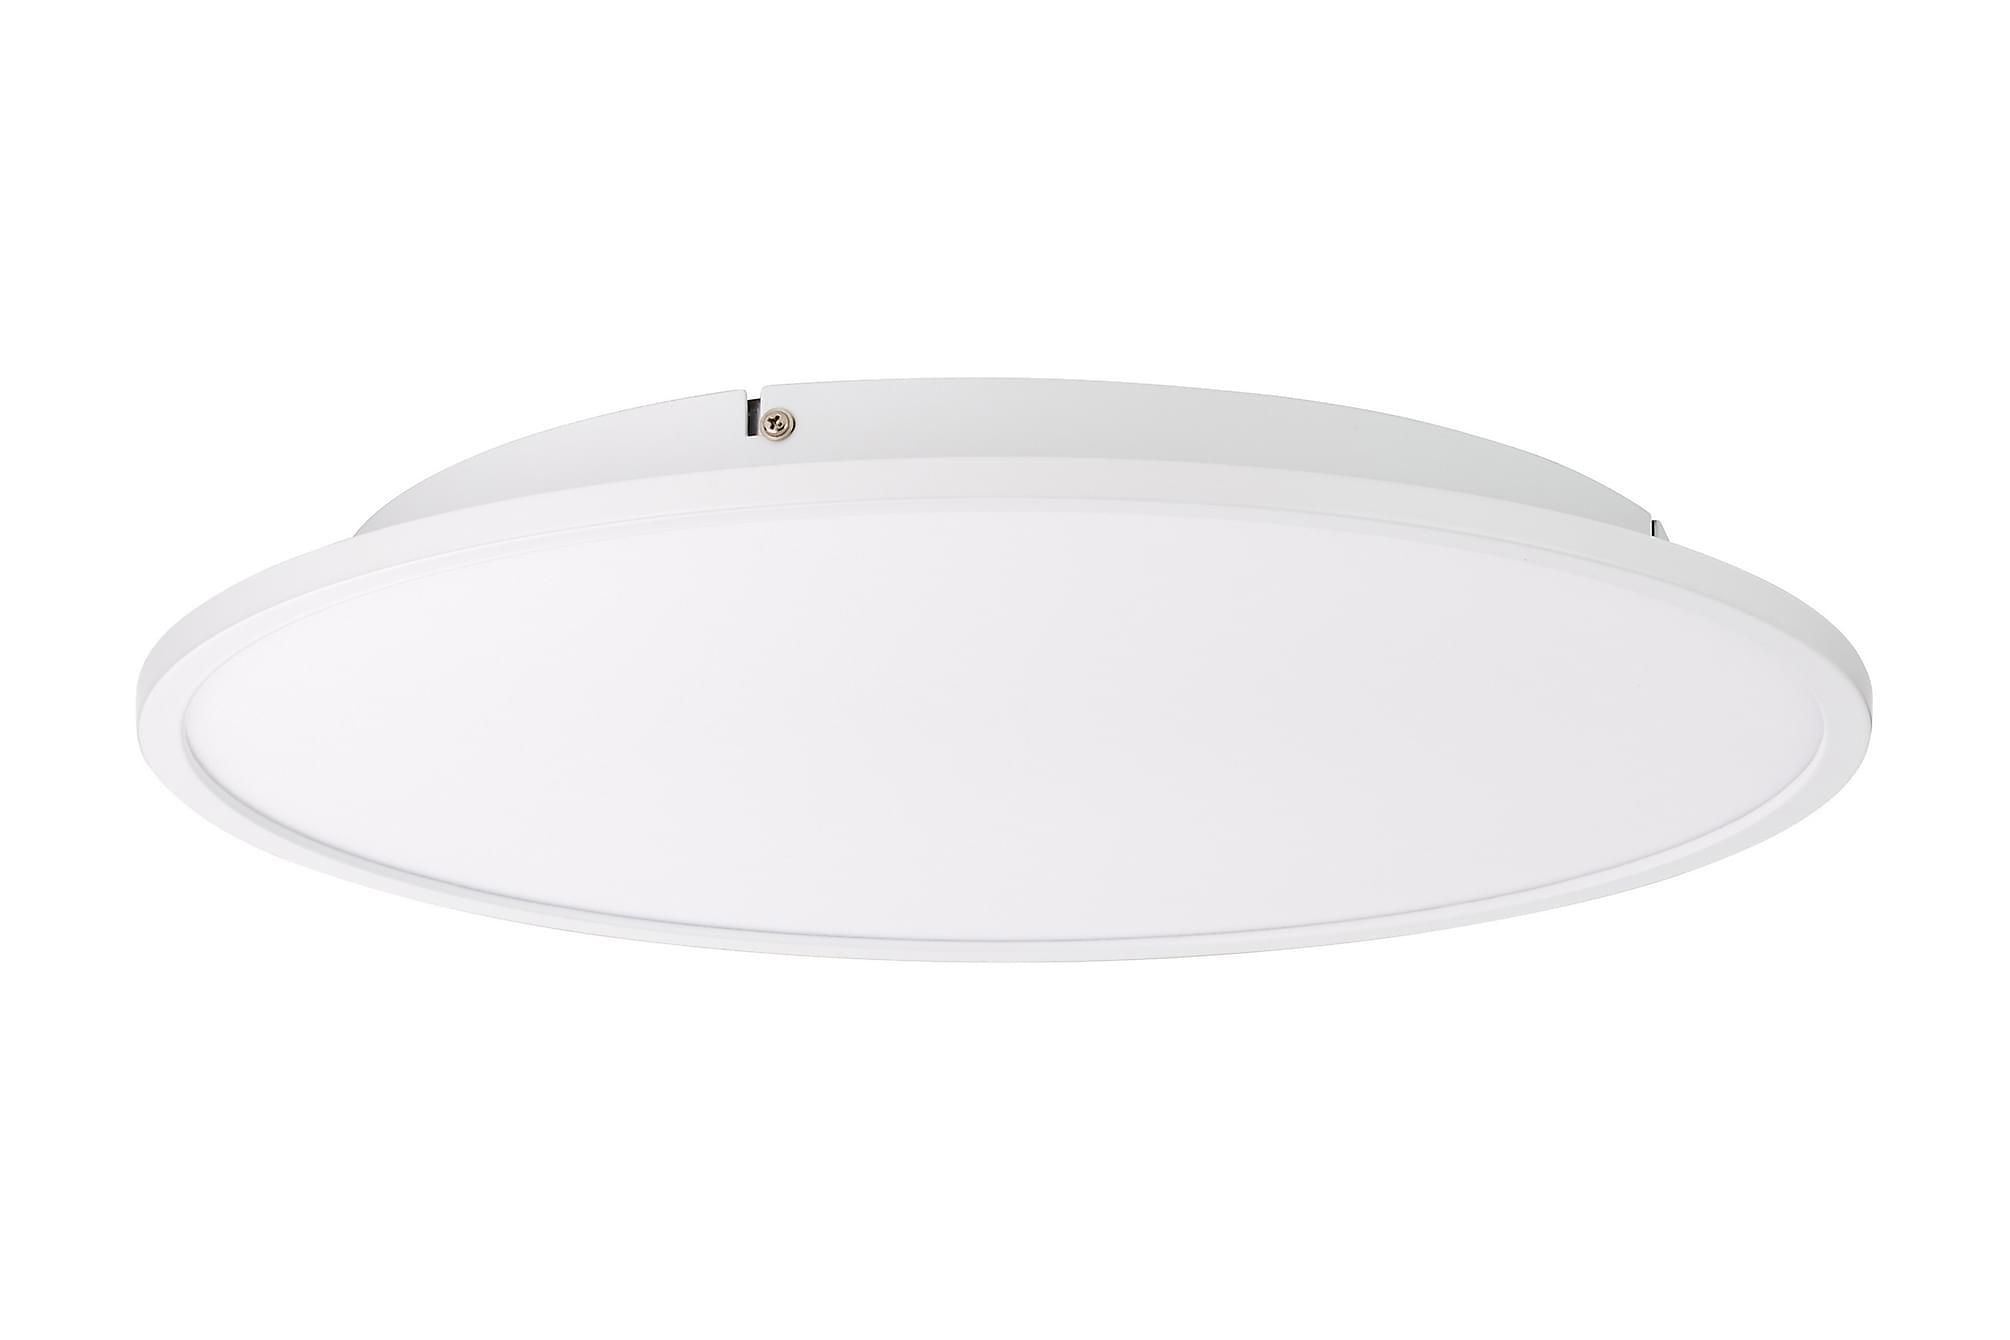 CERDIC Taklampa Dimbar LED 45 Vit, Taklampor